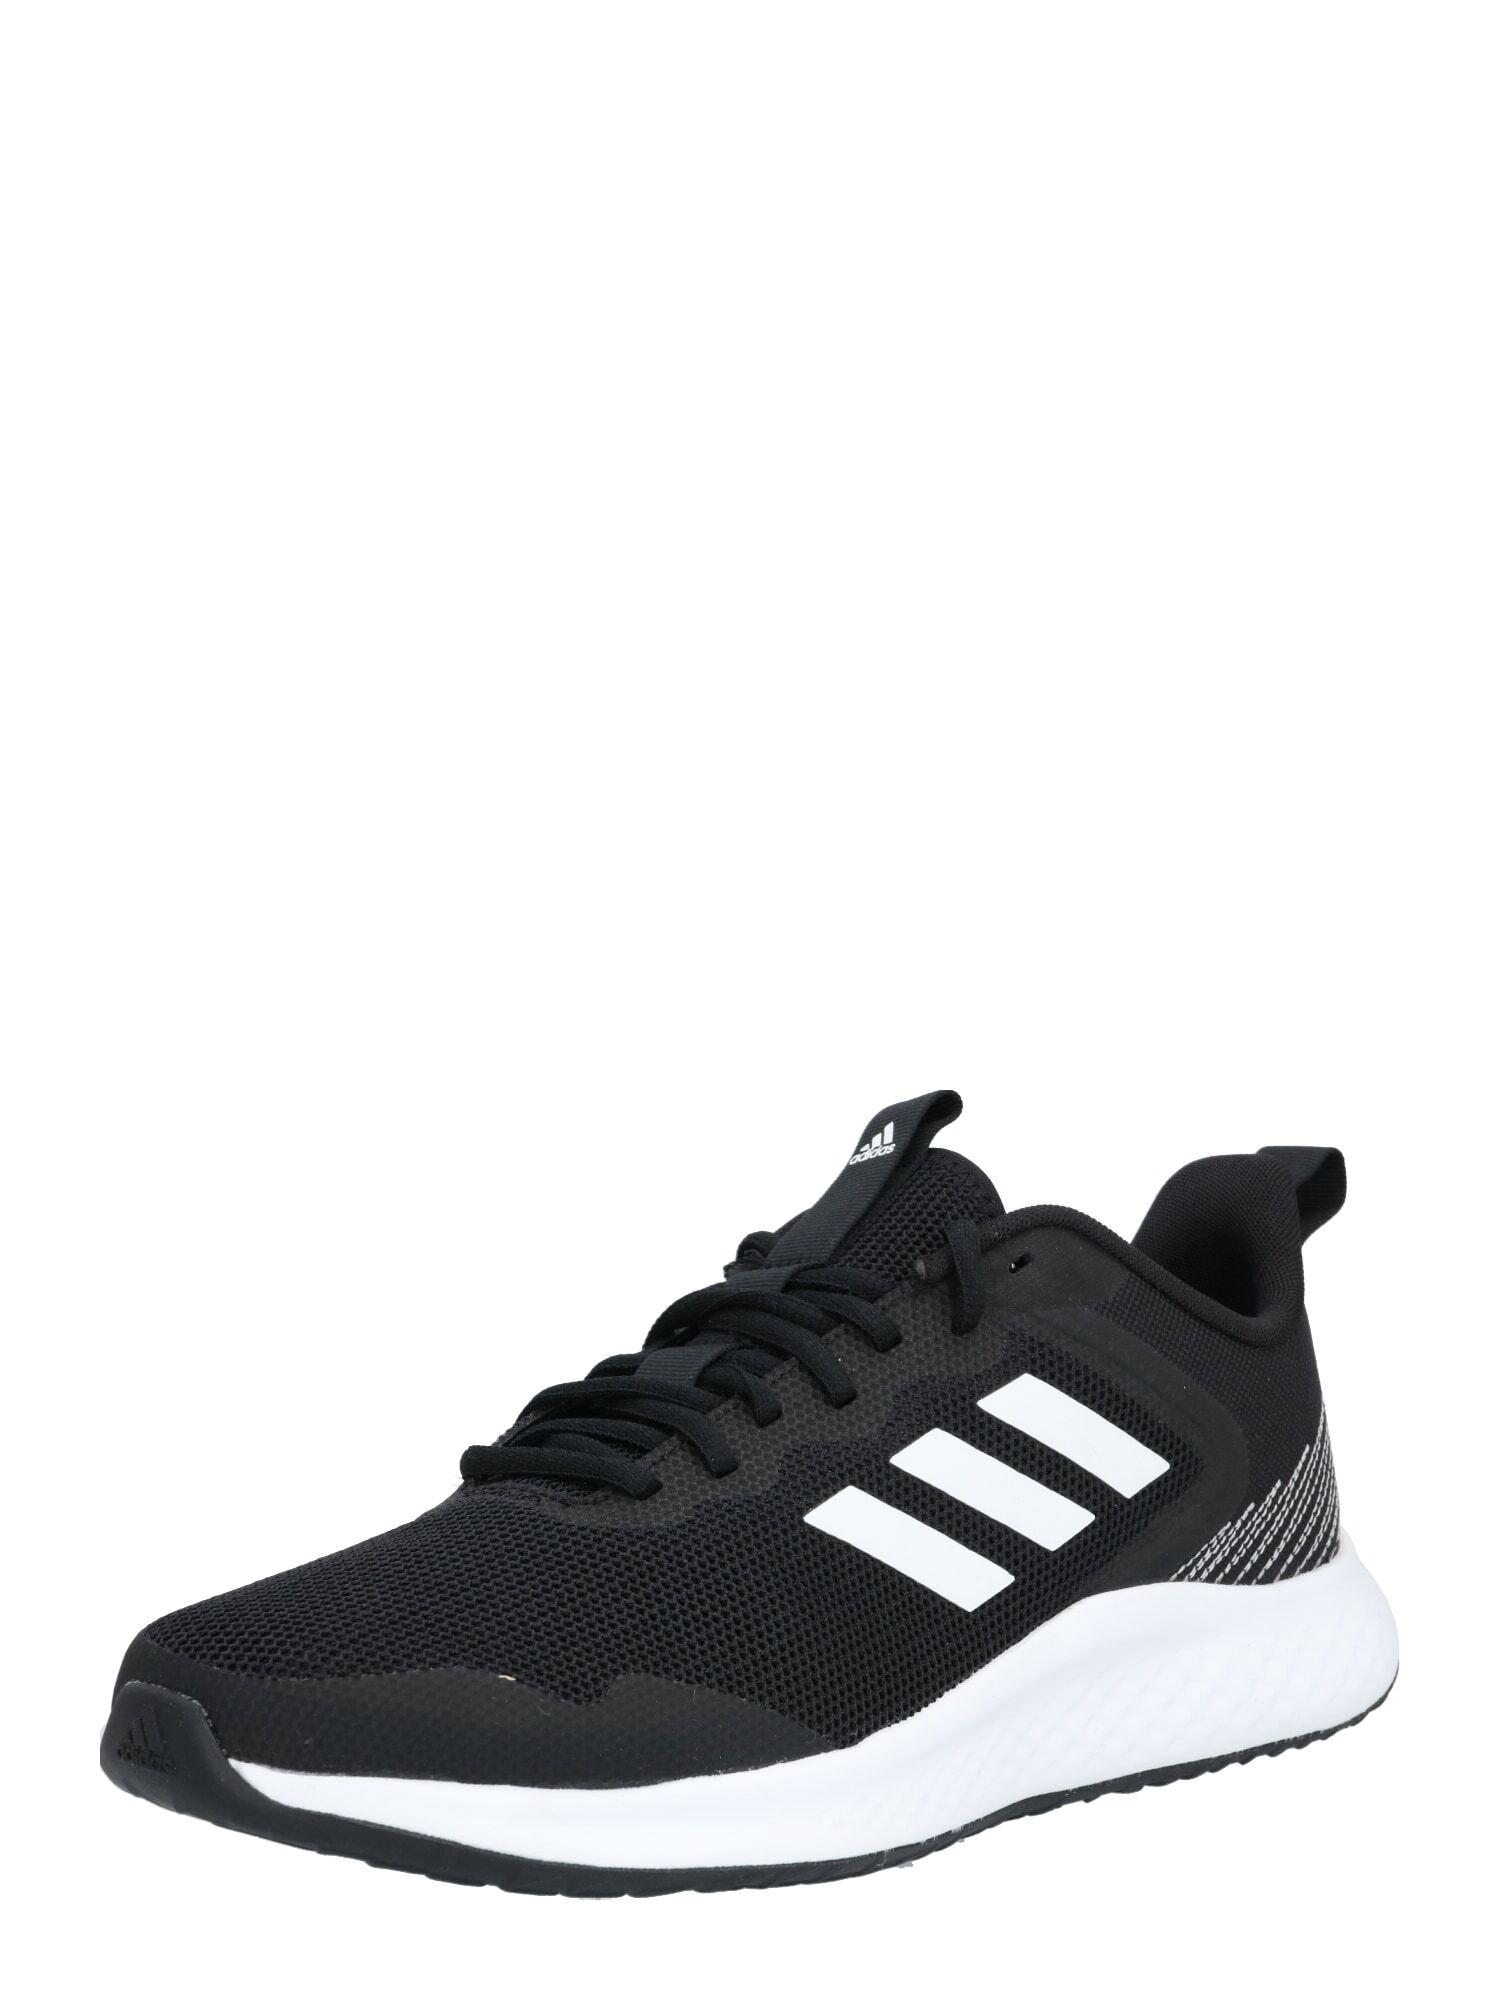 ADIDAS PERFORMANCE Chaussure de course 'Fluid Street'  - Noir - Taille: 7 - male